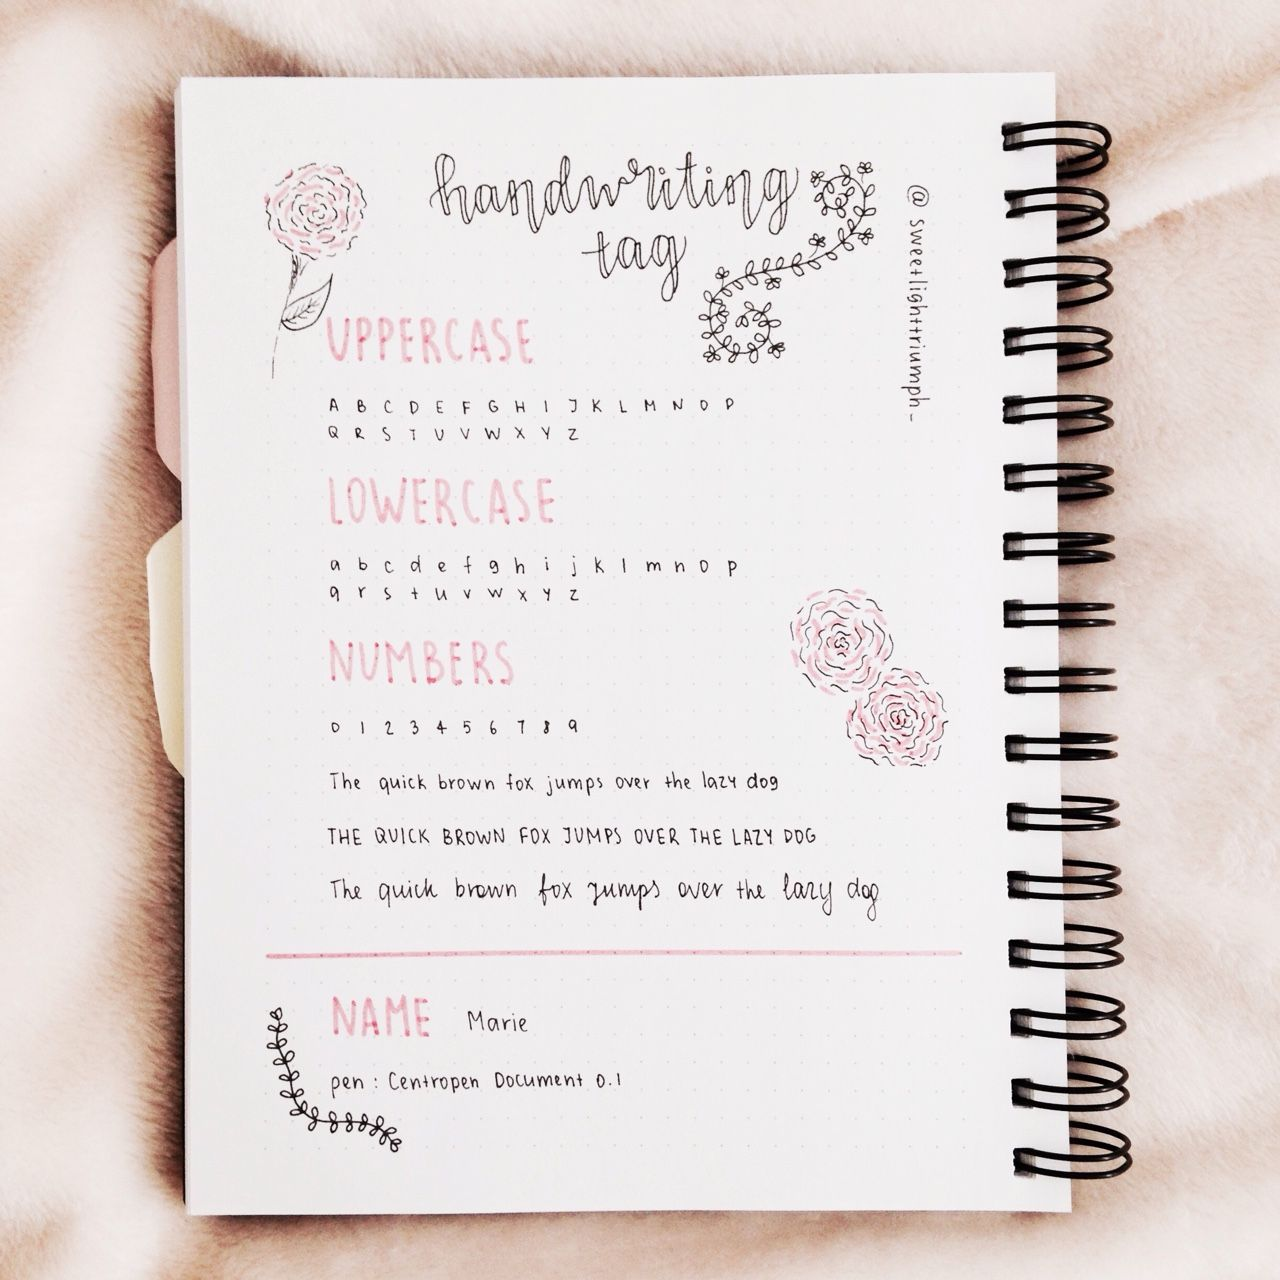 Officiallystudying Sweetlighttriumph Handwriting